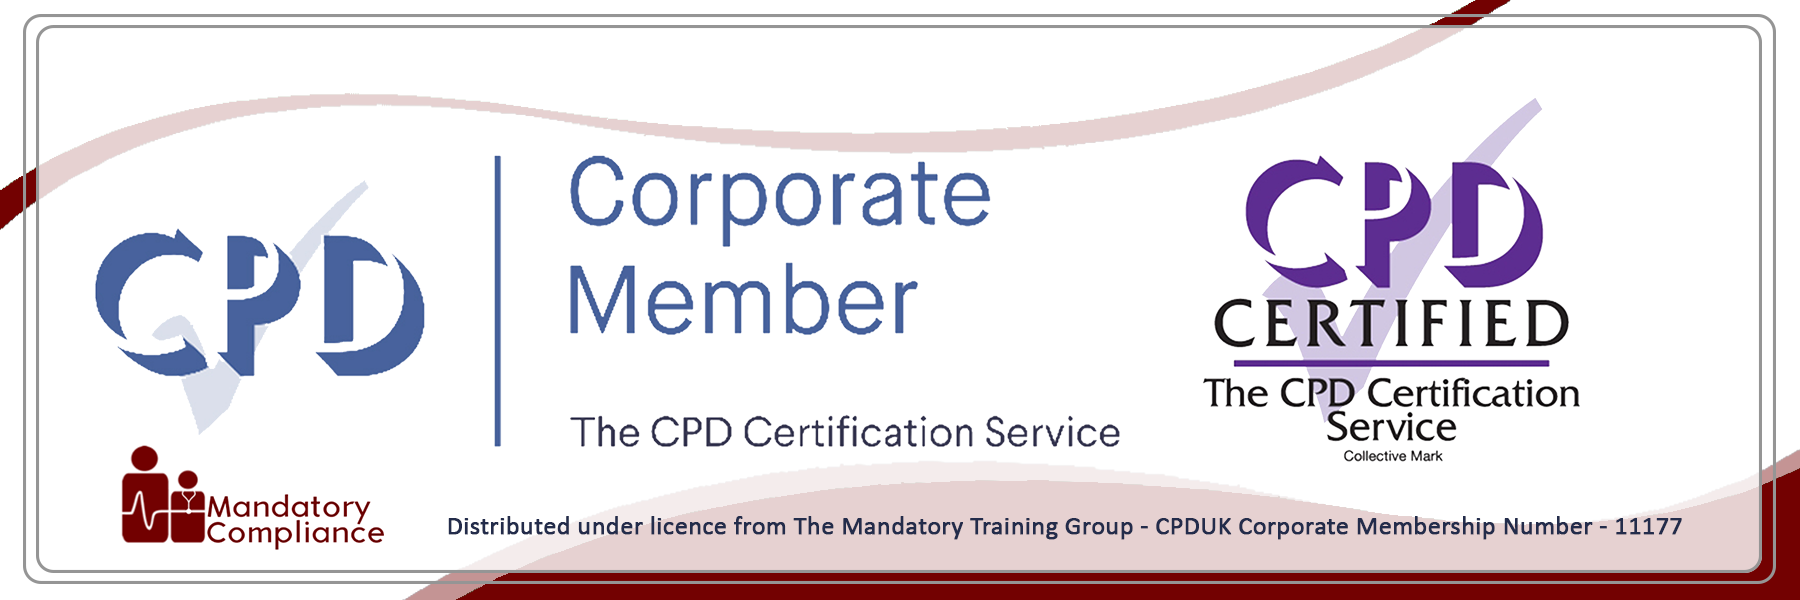 Office Guru Secrets - Online Learning Courses - E-Learning Courses - Mandatory Compliance UK-